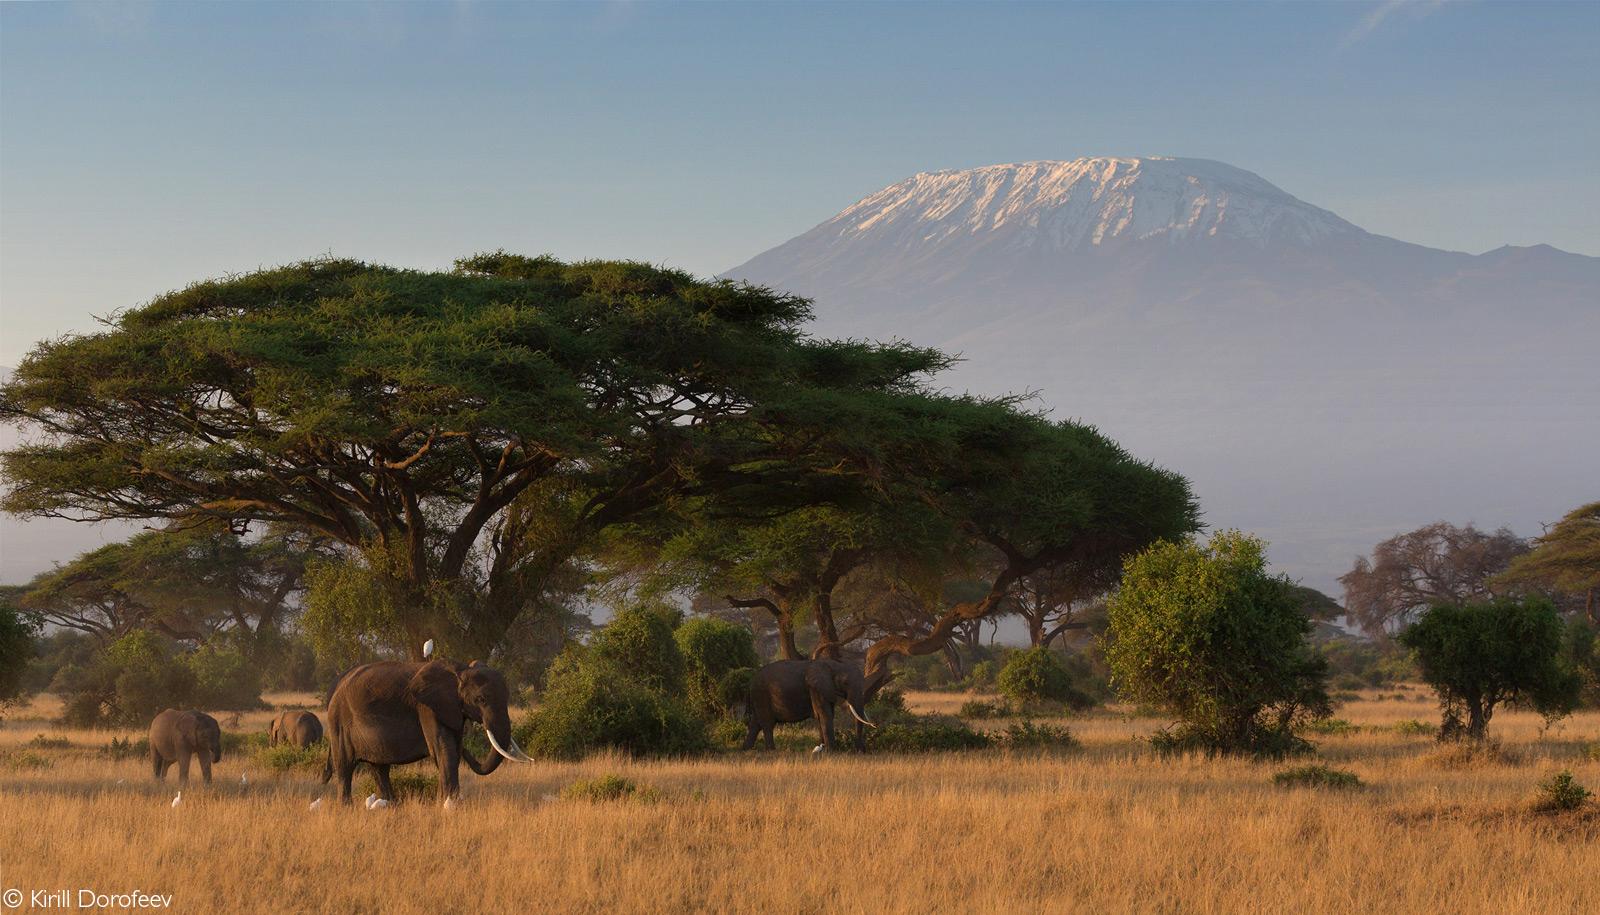 Elephants and Mount Kilimanjaro. Amboseli National Park, Kenya © Kirill Dorofeev